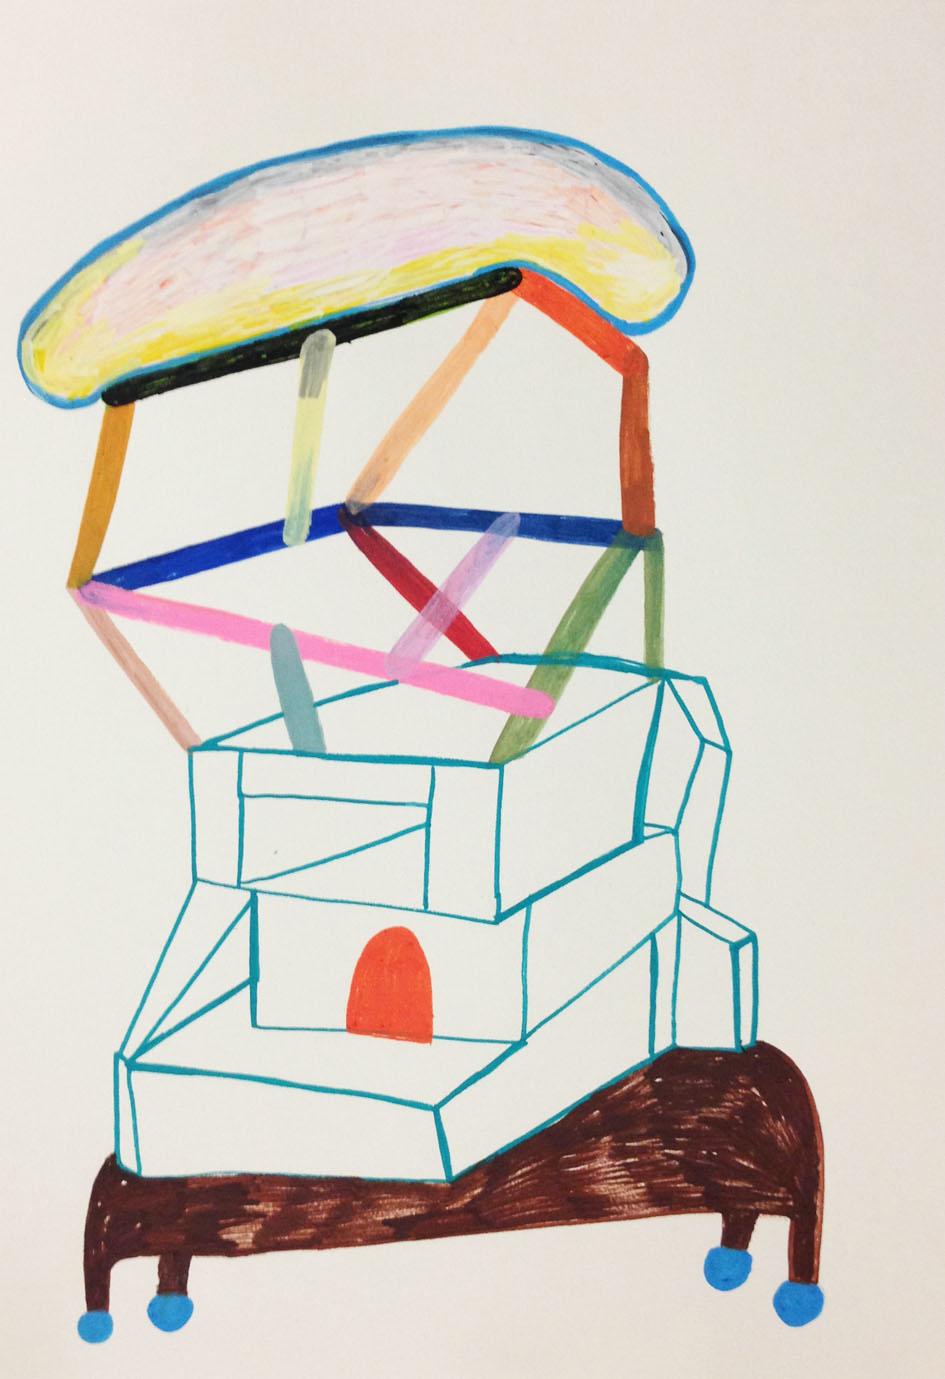 """Mental construction on skates""Acrylic tusch on paper.42 x 29,7 cm.2014 -"